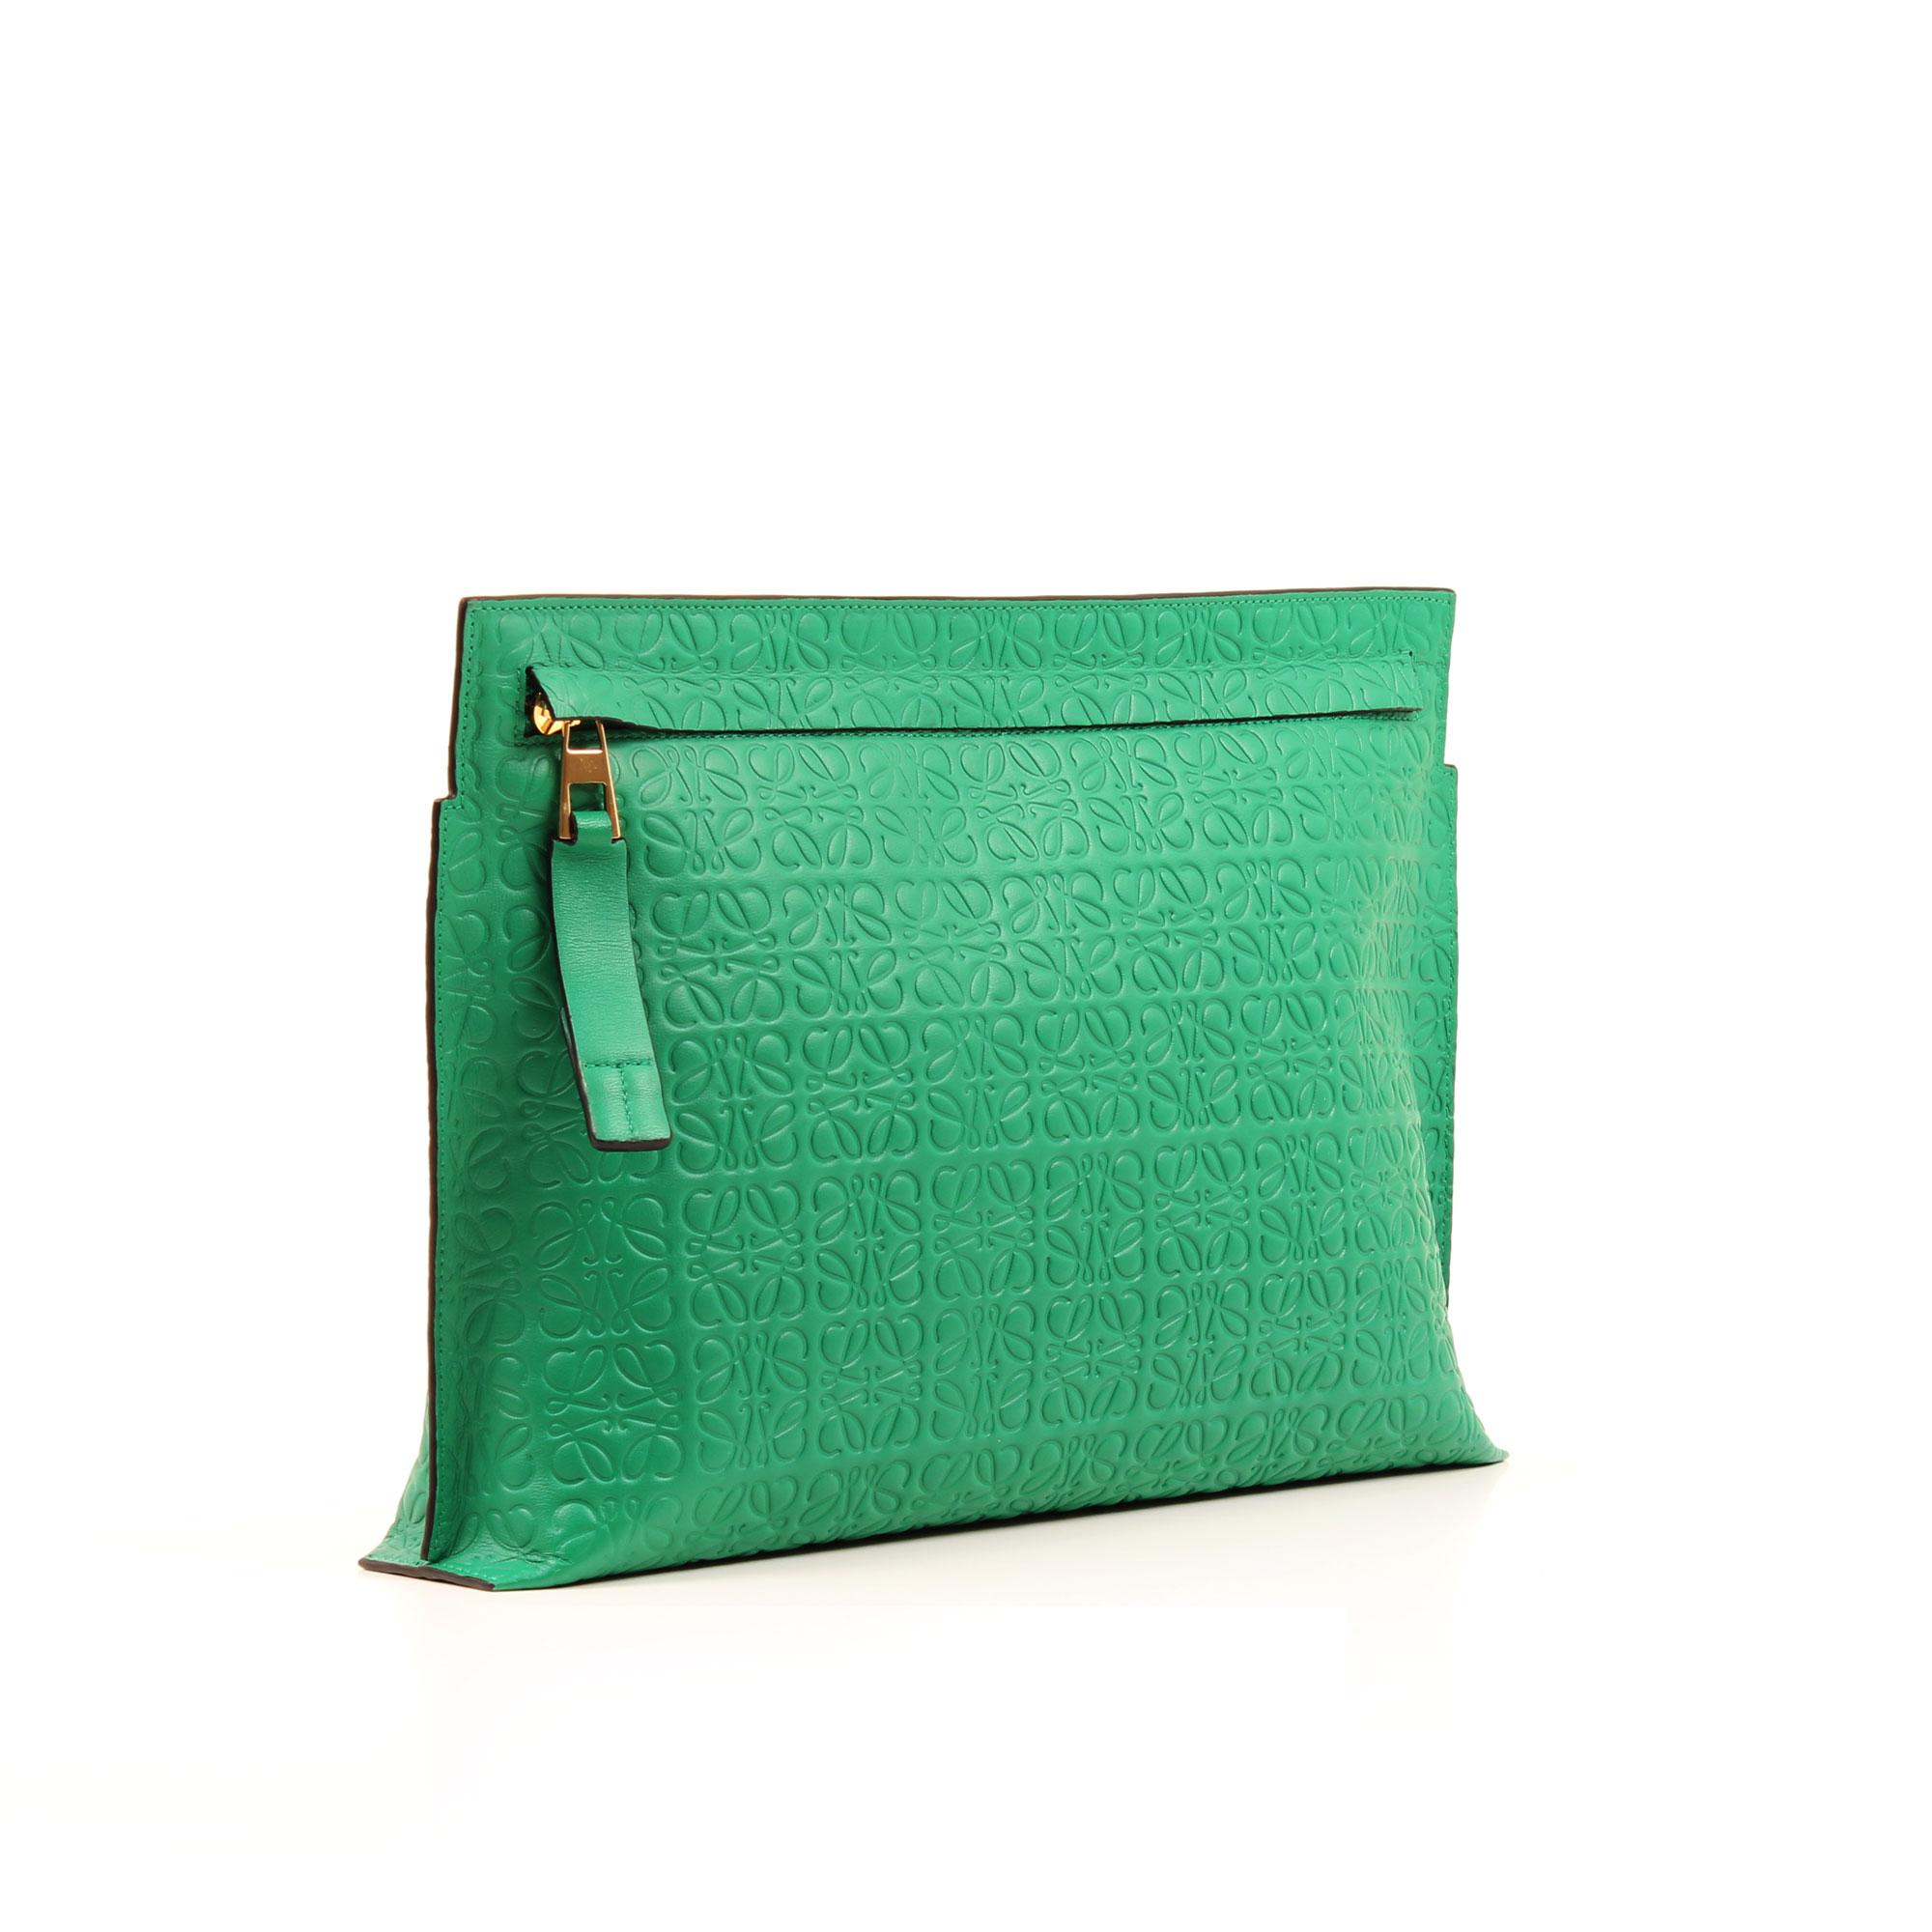 Imagen general del bolso clutch loewe t pouch verde embossed